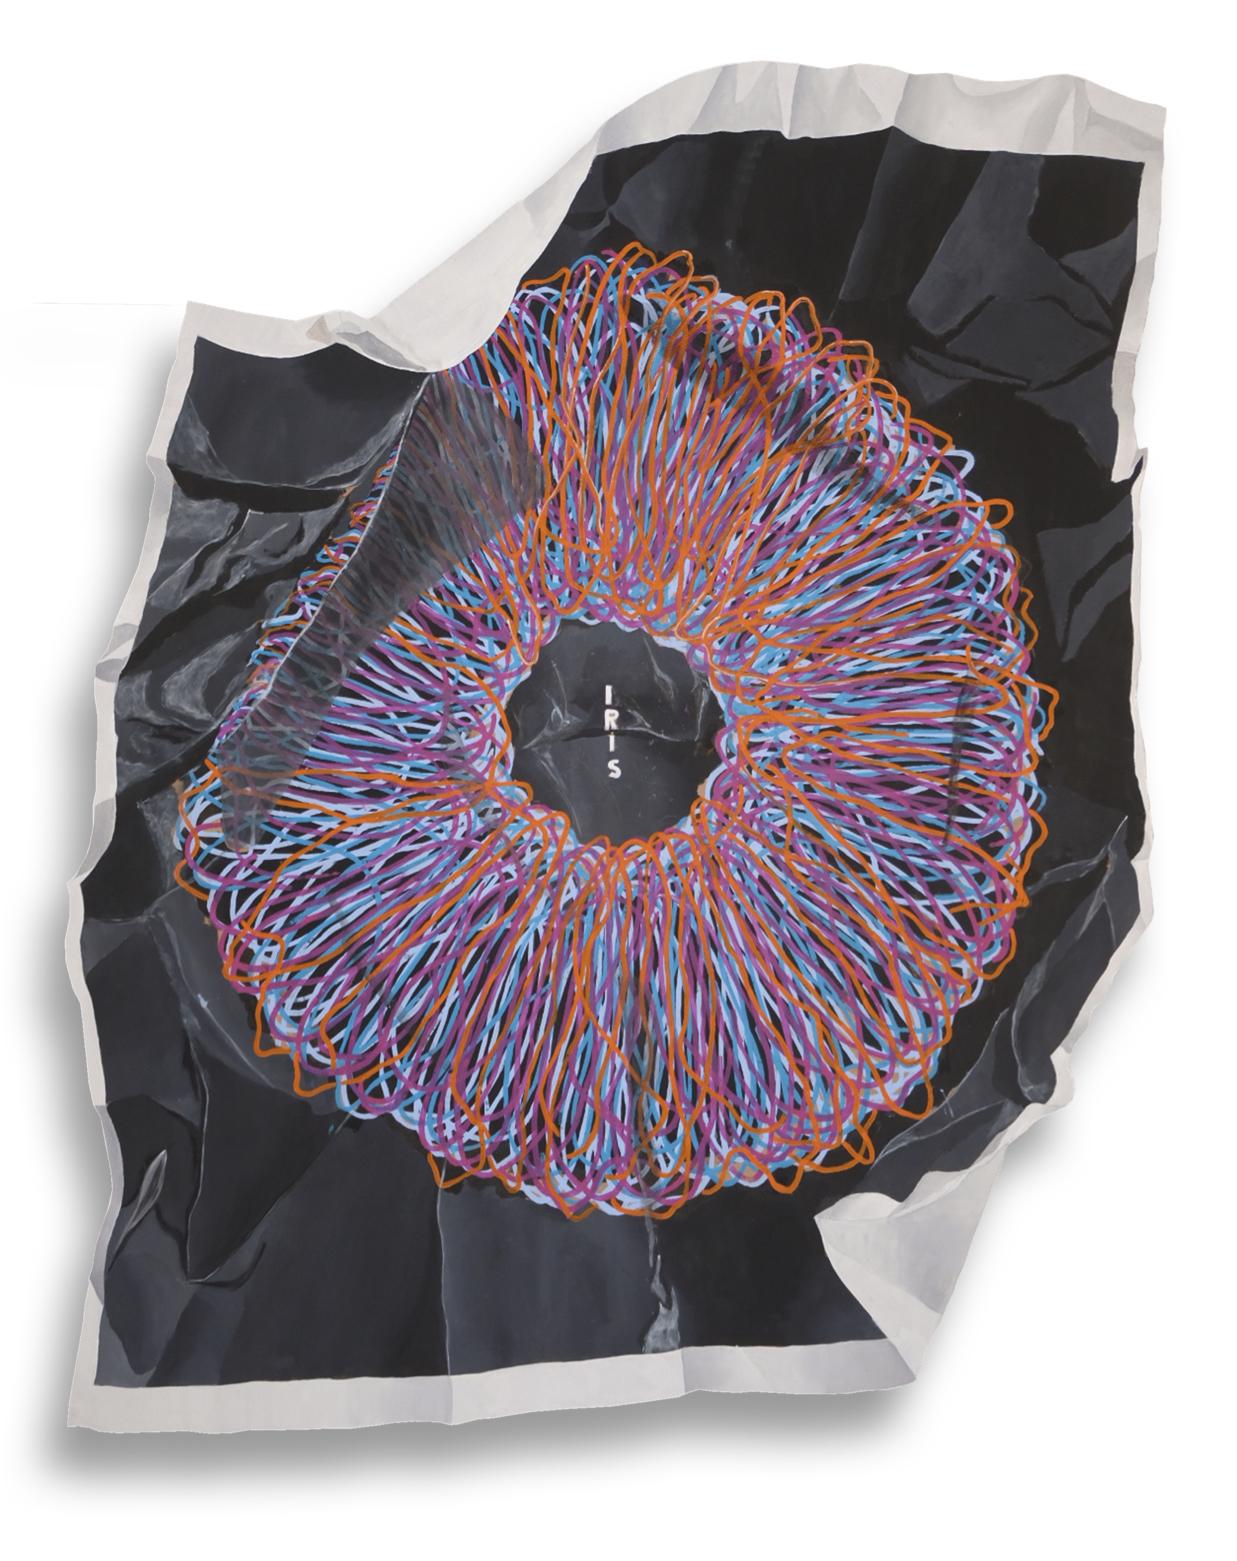 Iris - 2020 - Collaboration with Alex Spoettel (MediaDesign) - 160cm x 150cm (SOLD)